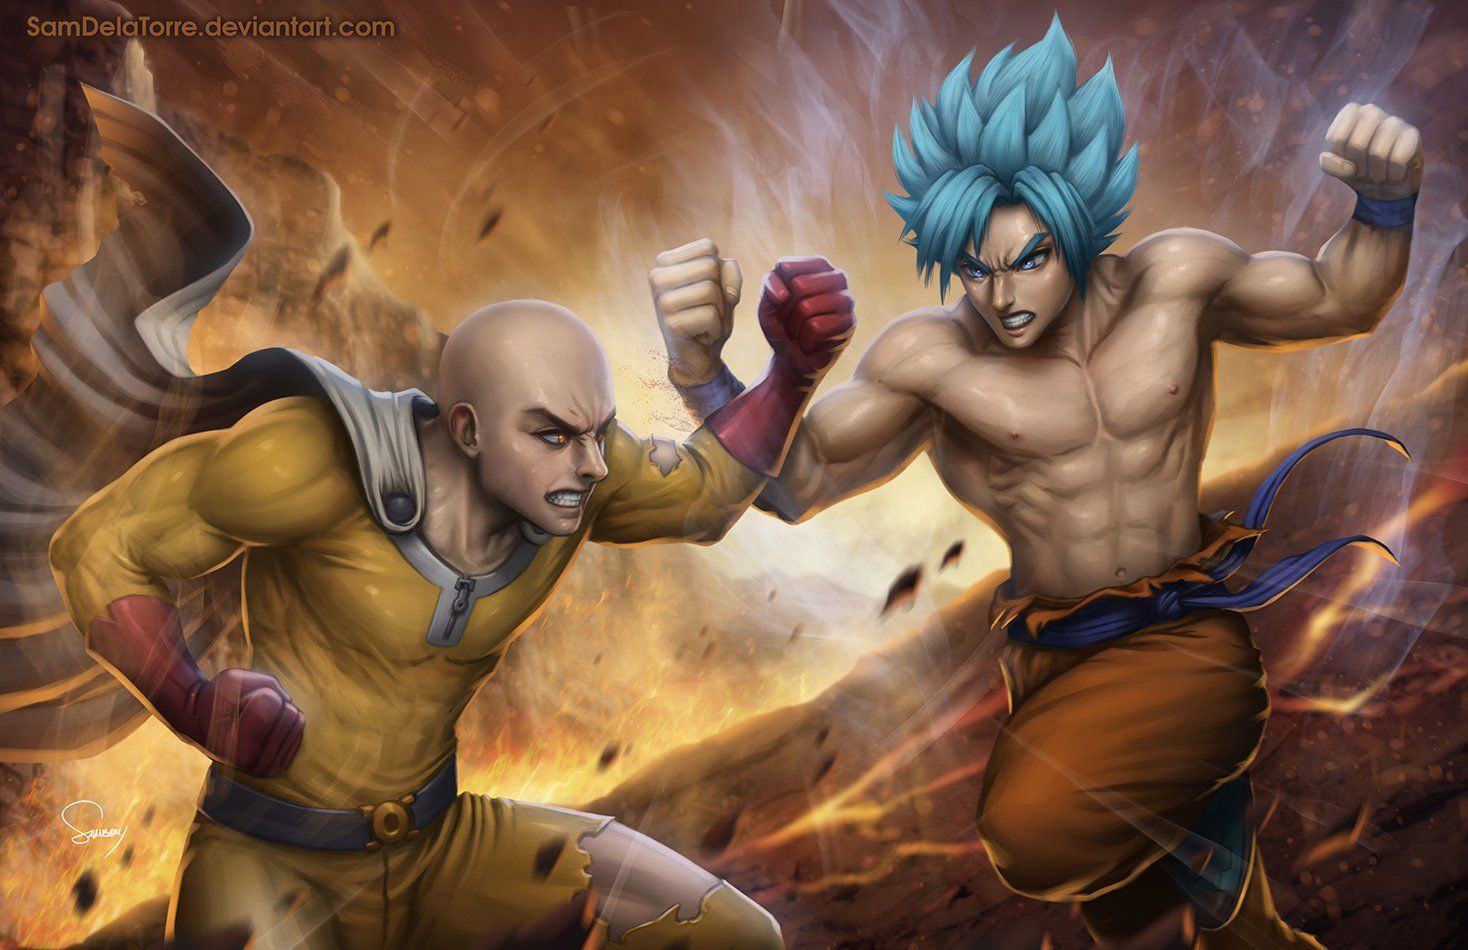 Goku Vs Saitama Quien Es Mas Fuerte One Punch Man One Punch Man Anime Goku Vs